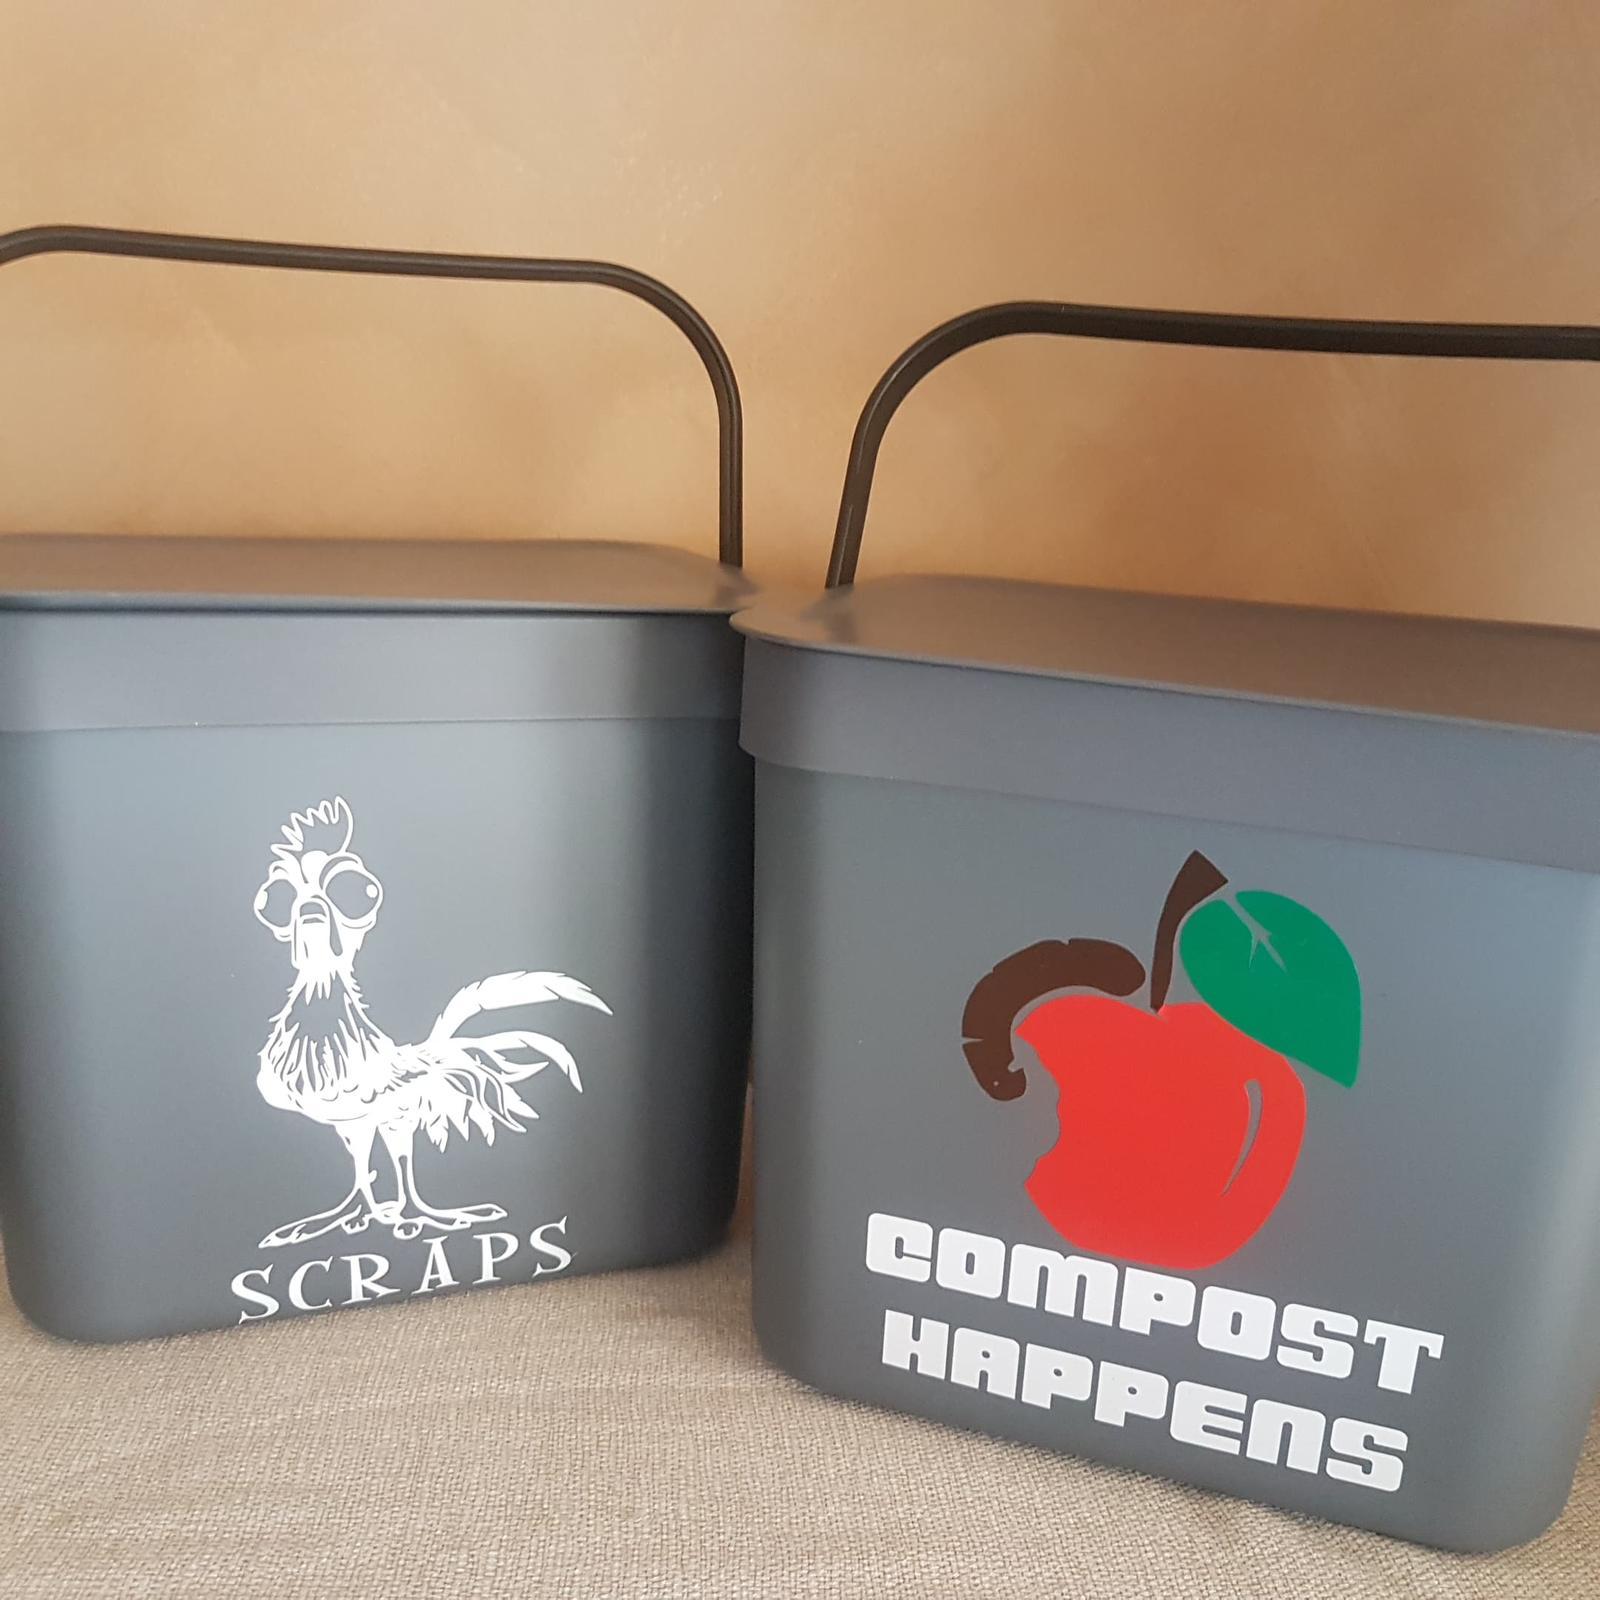 Chook scraps and compost bins